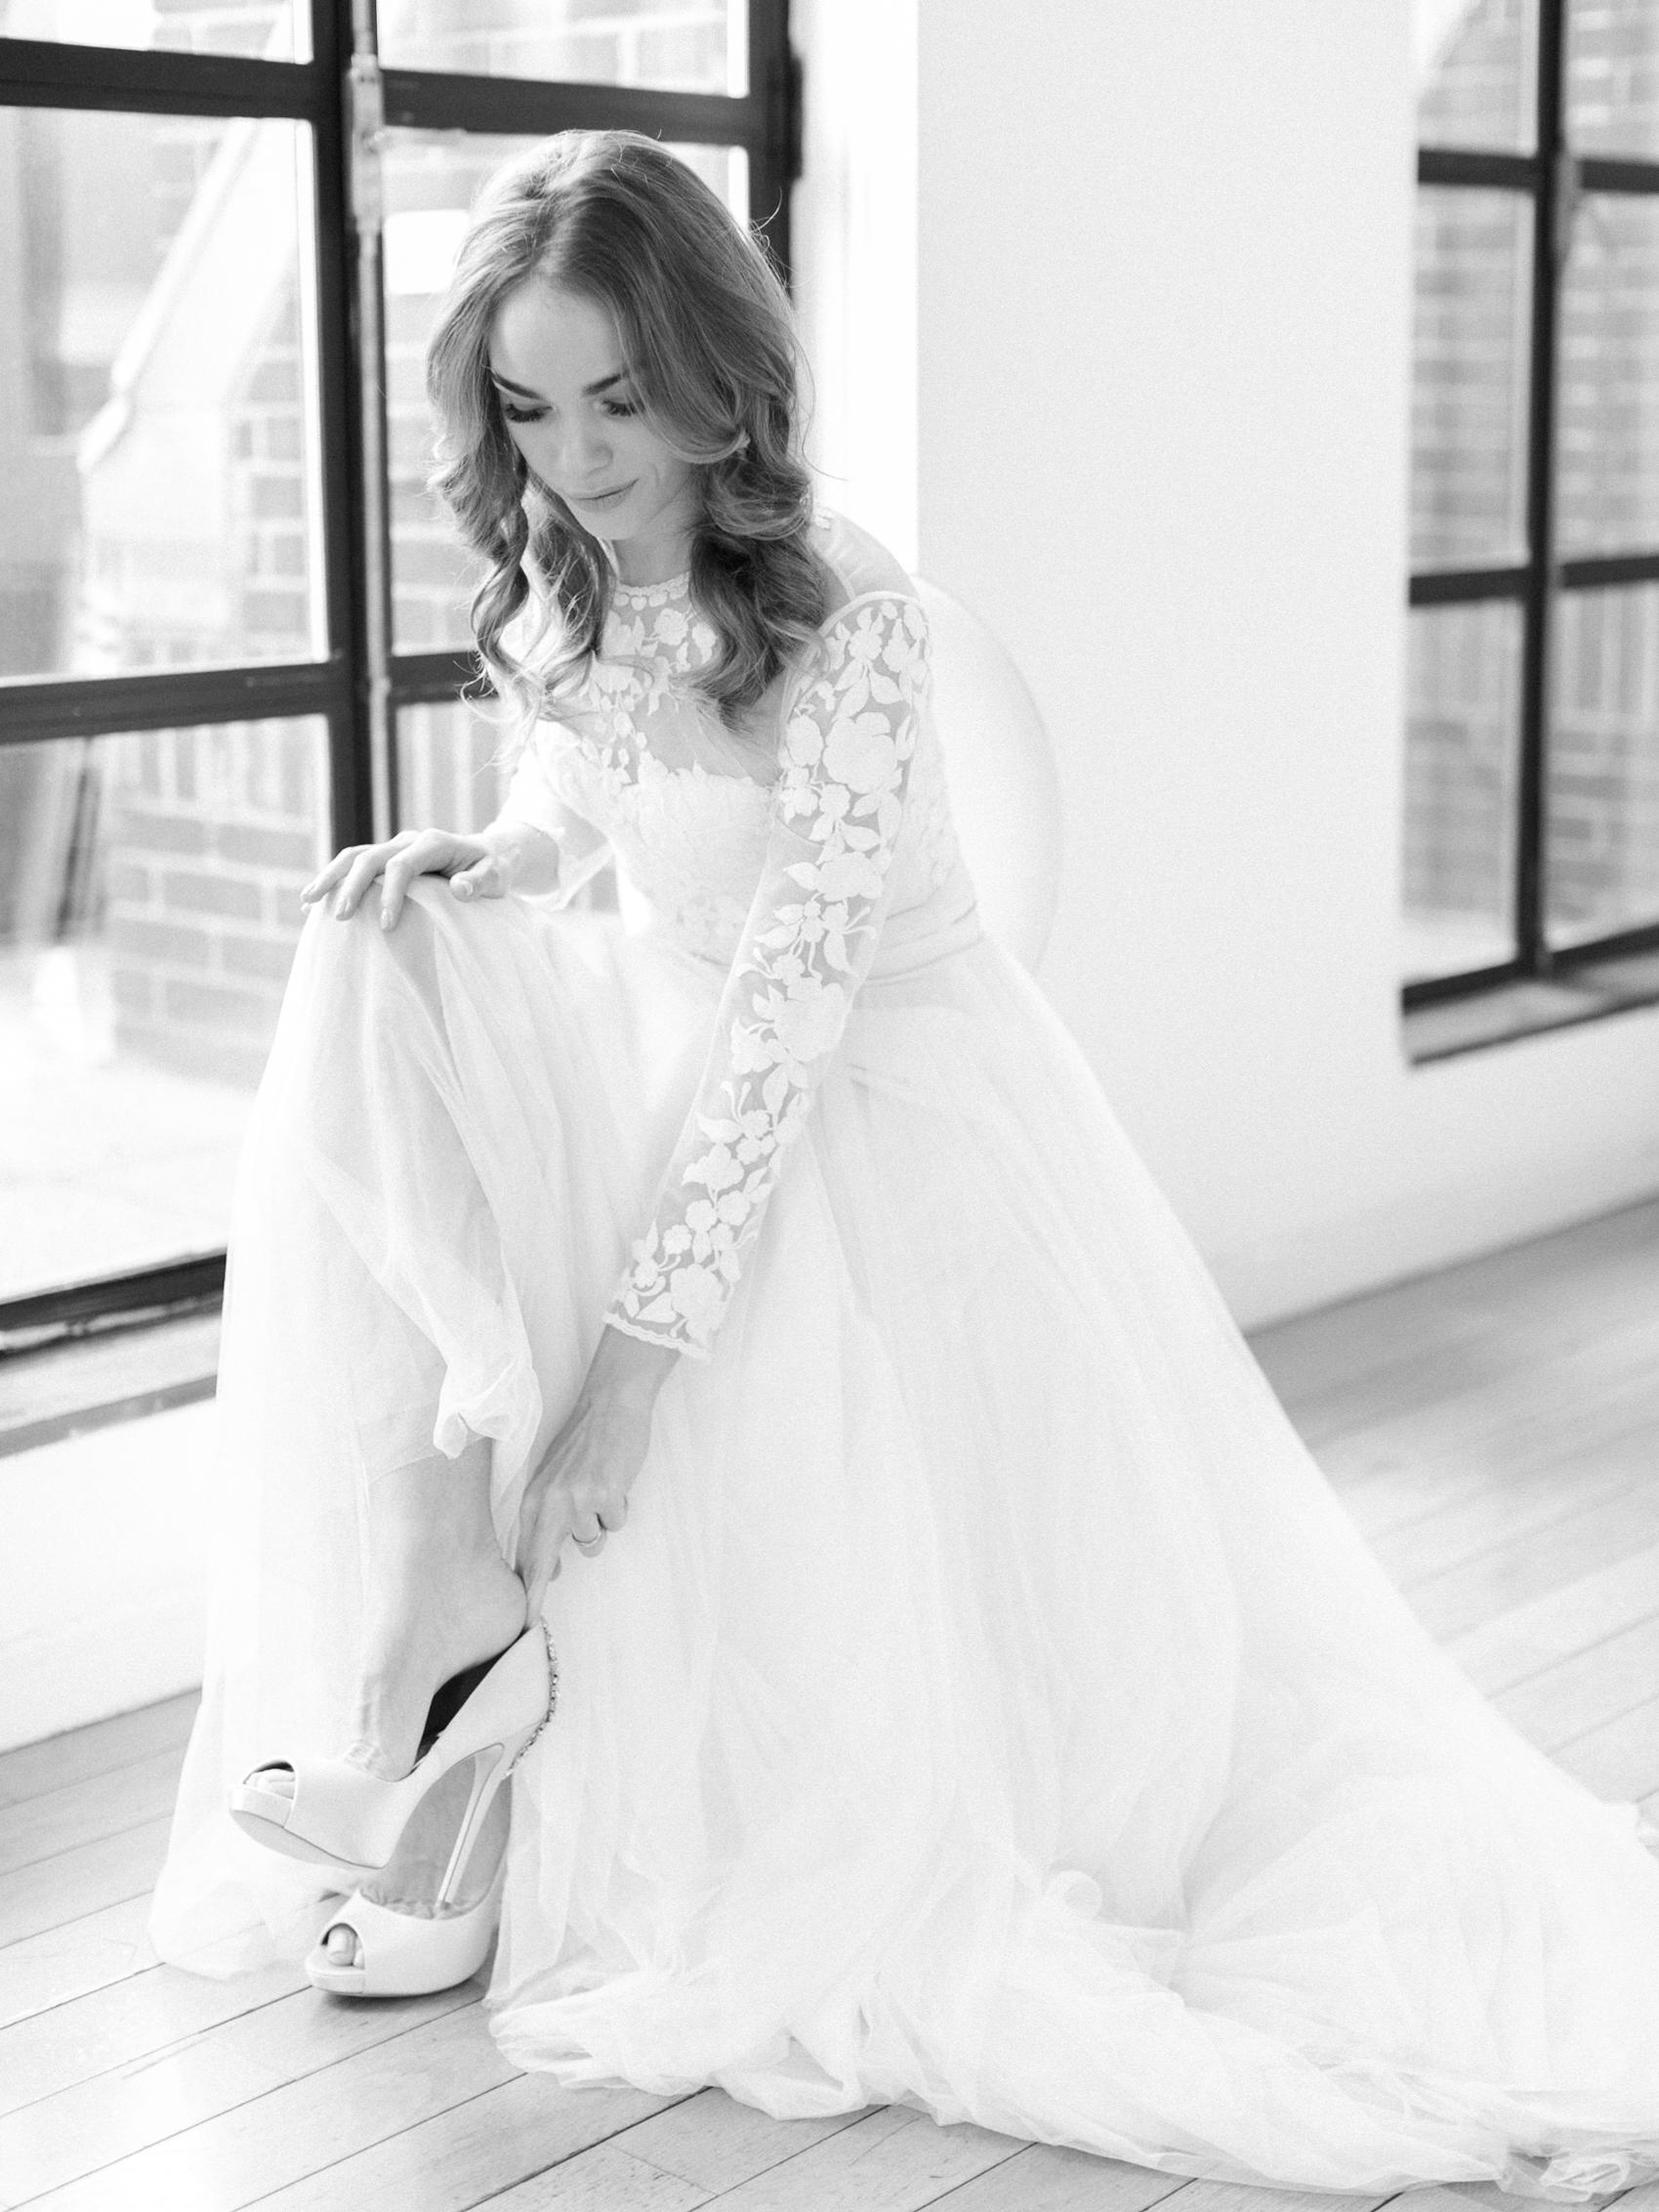 asher-gardner-photography-bryant-park-wedding-00028.jpg